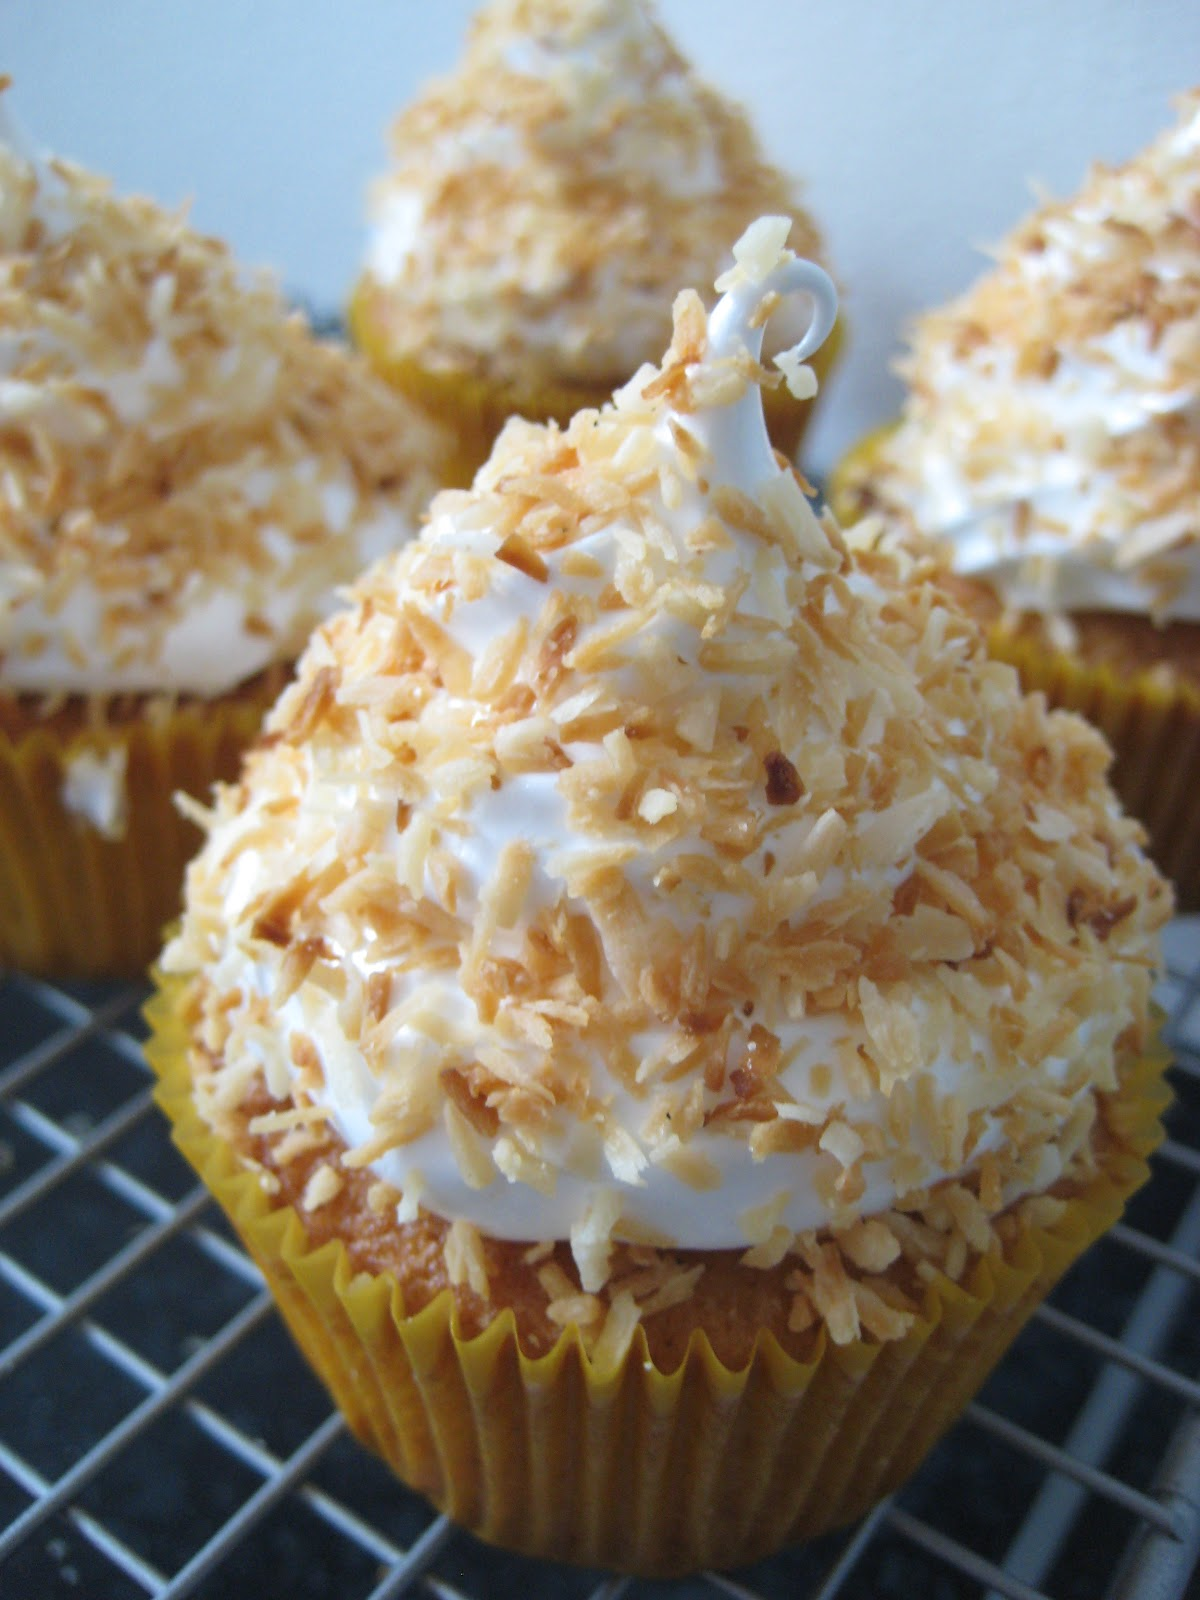 ... , lactose free) cake!: Vanilla coconut cupcakes - Cupcake book club